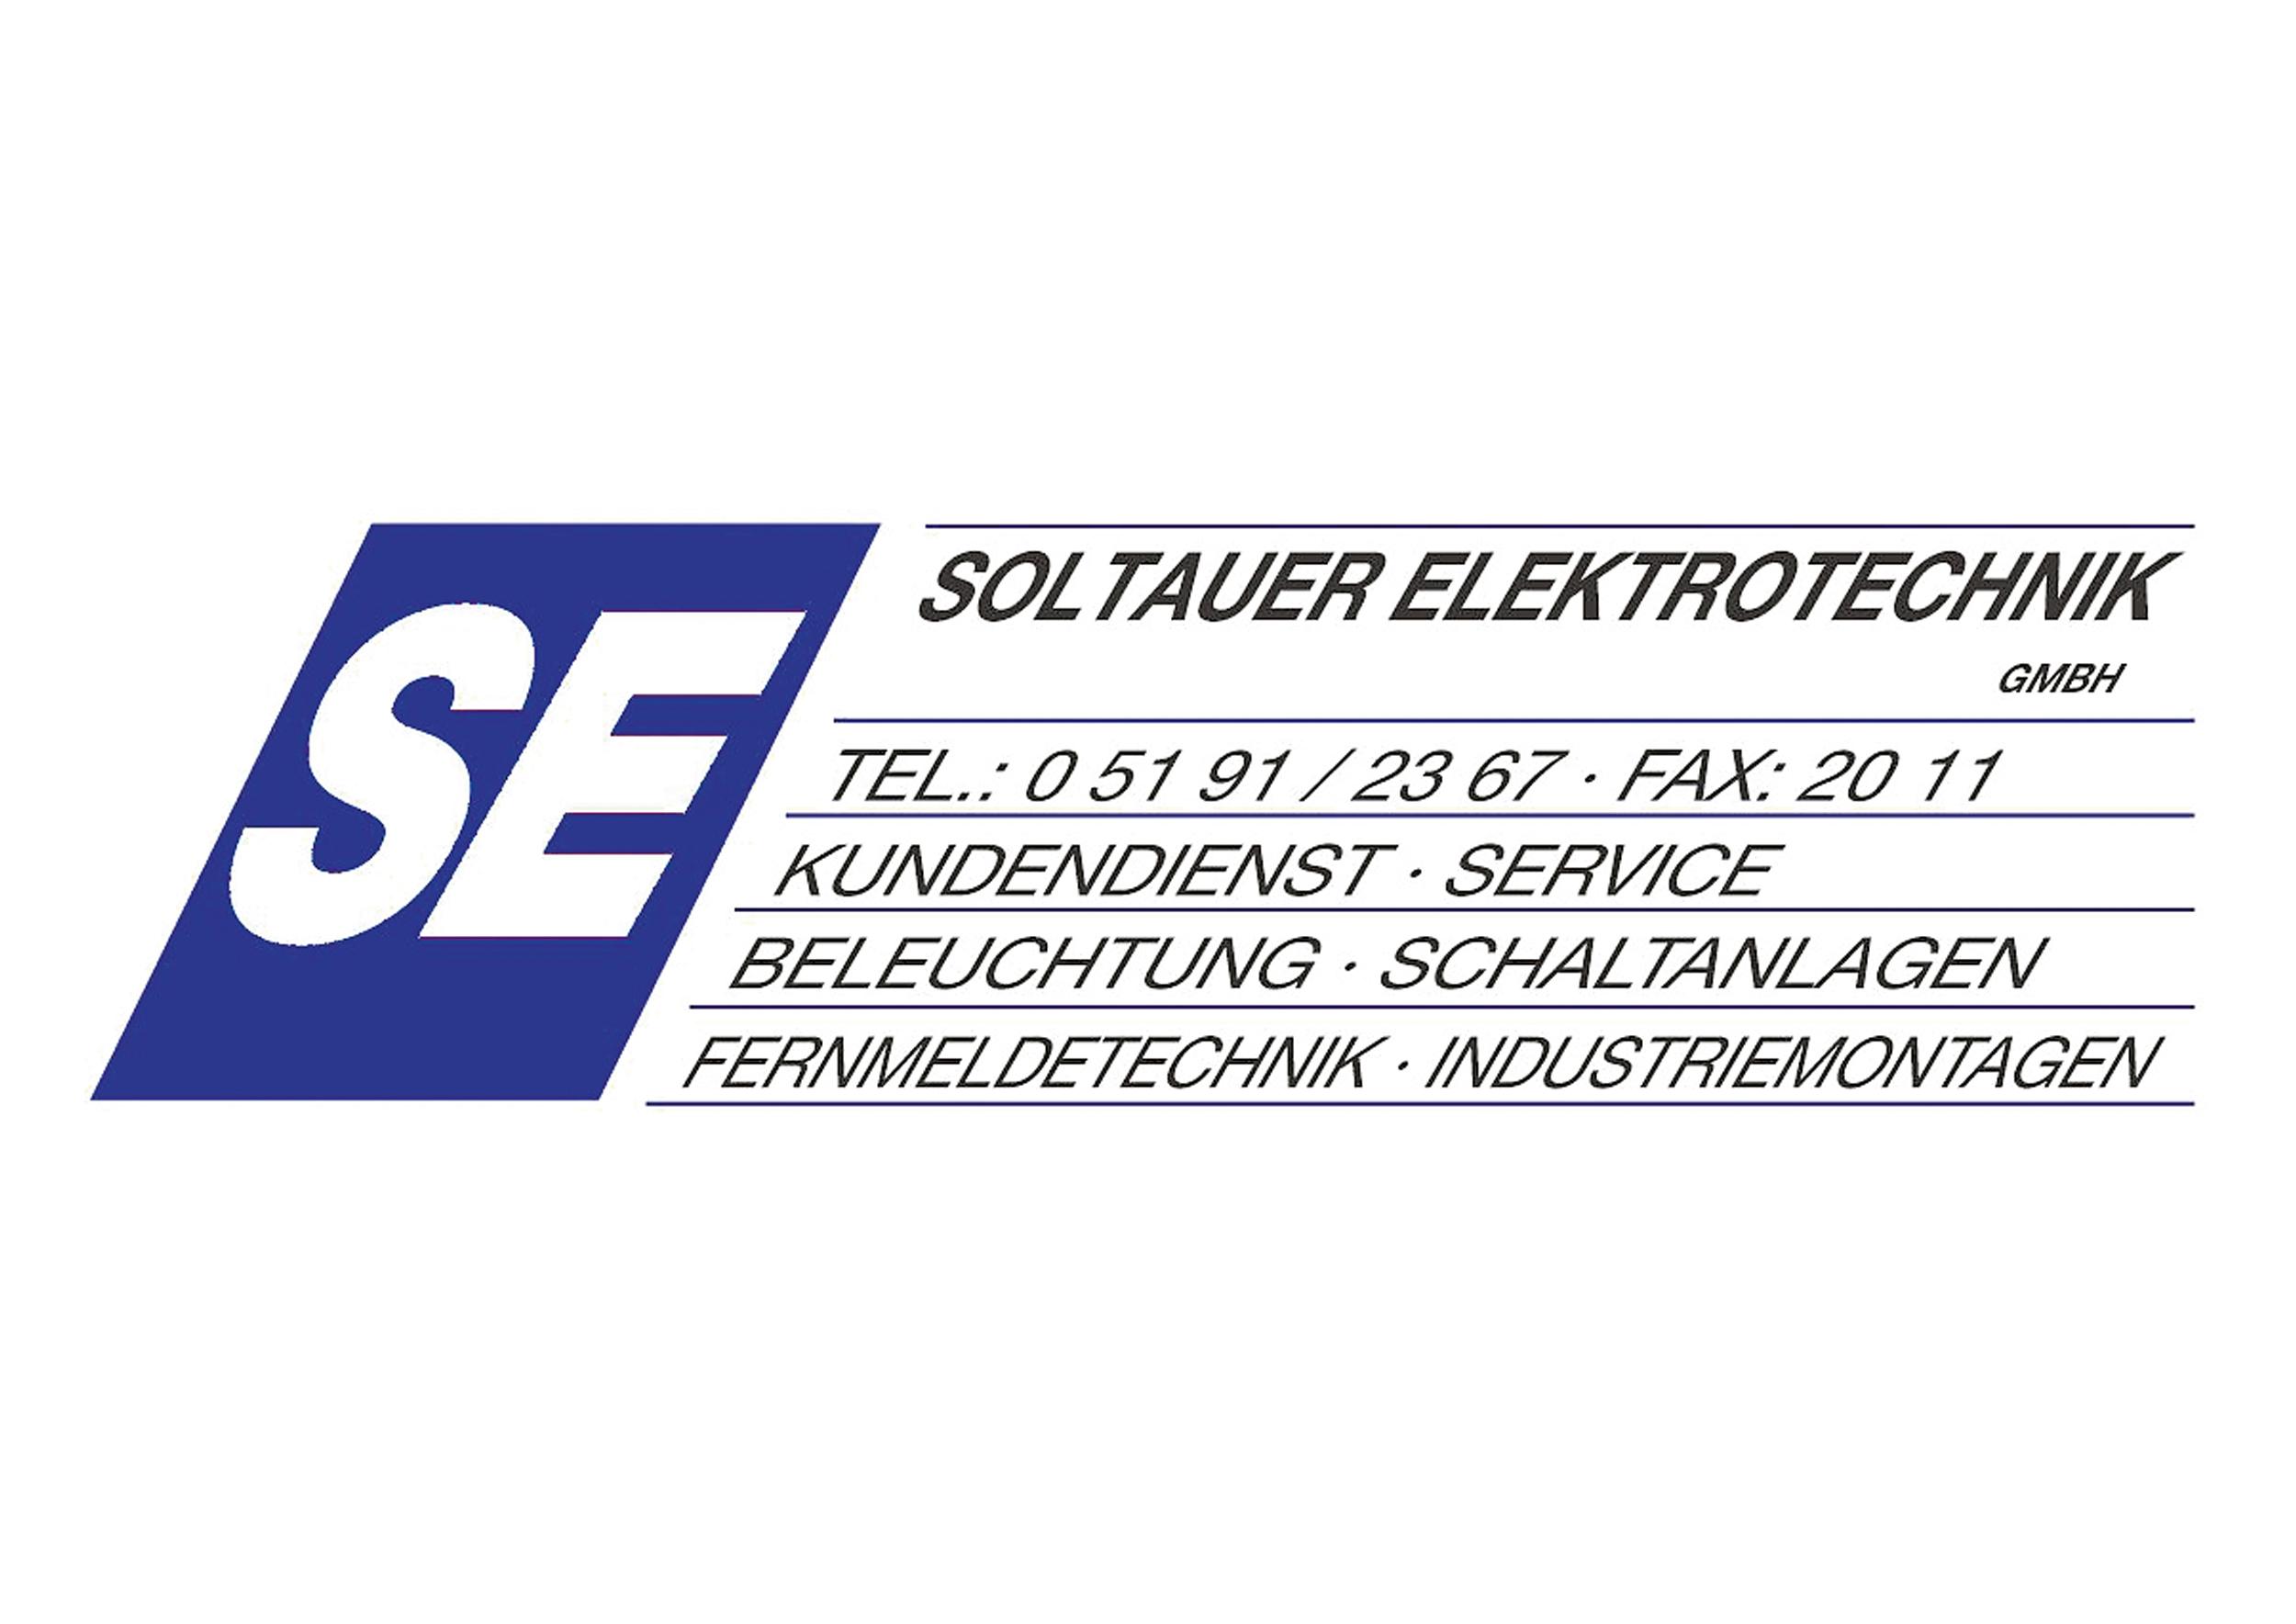 bzb_web_soltauer_elektrotechnik_logo_2500x1768.jpg